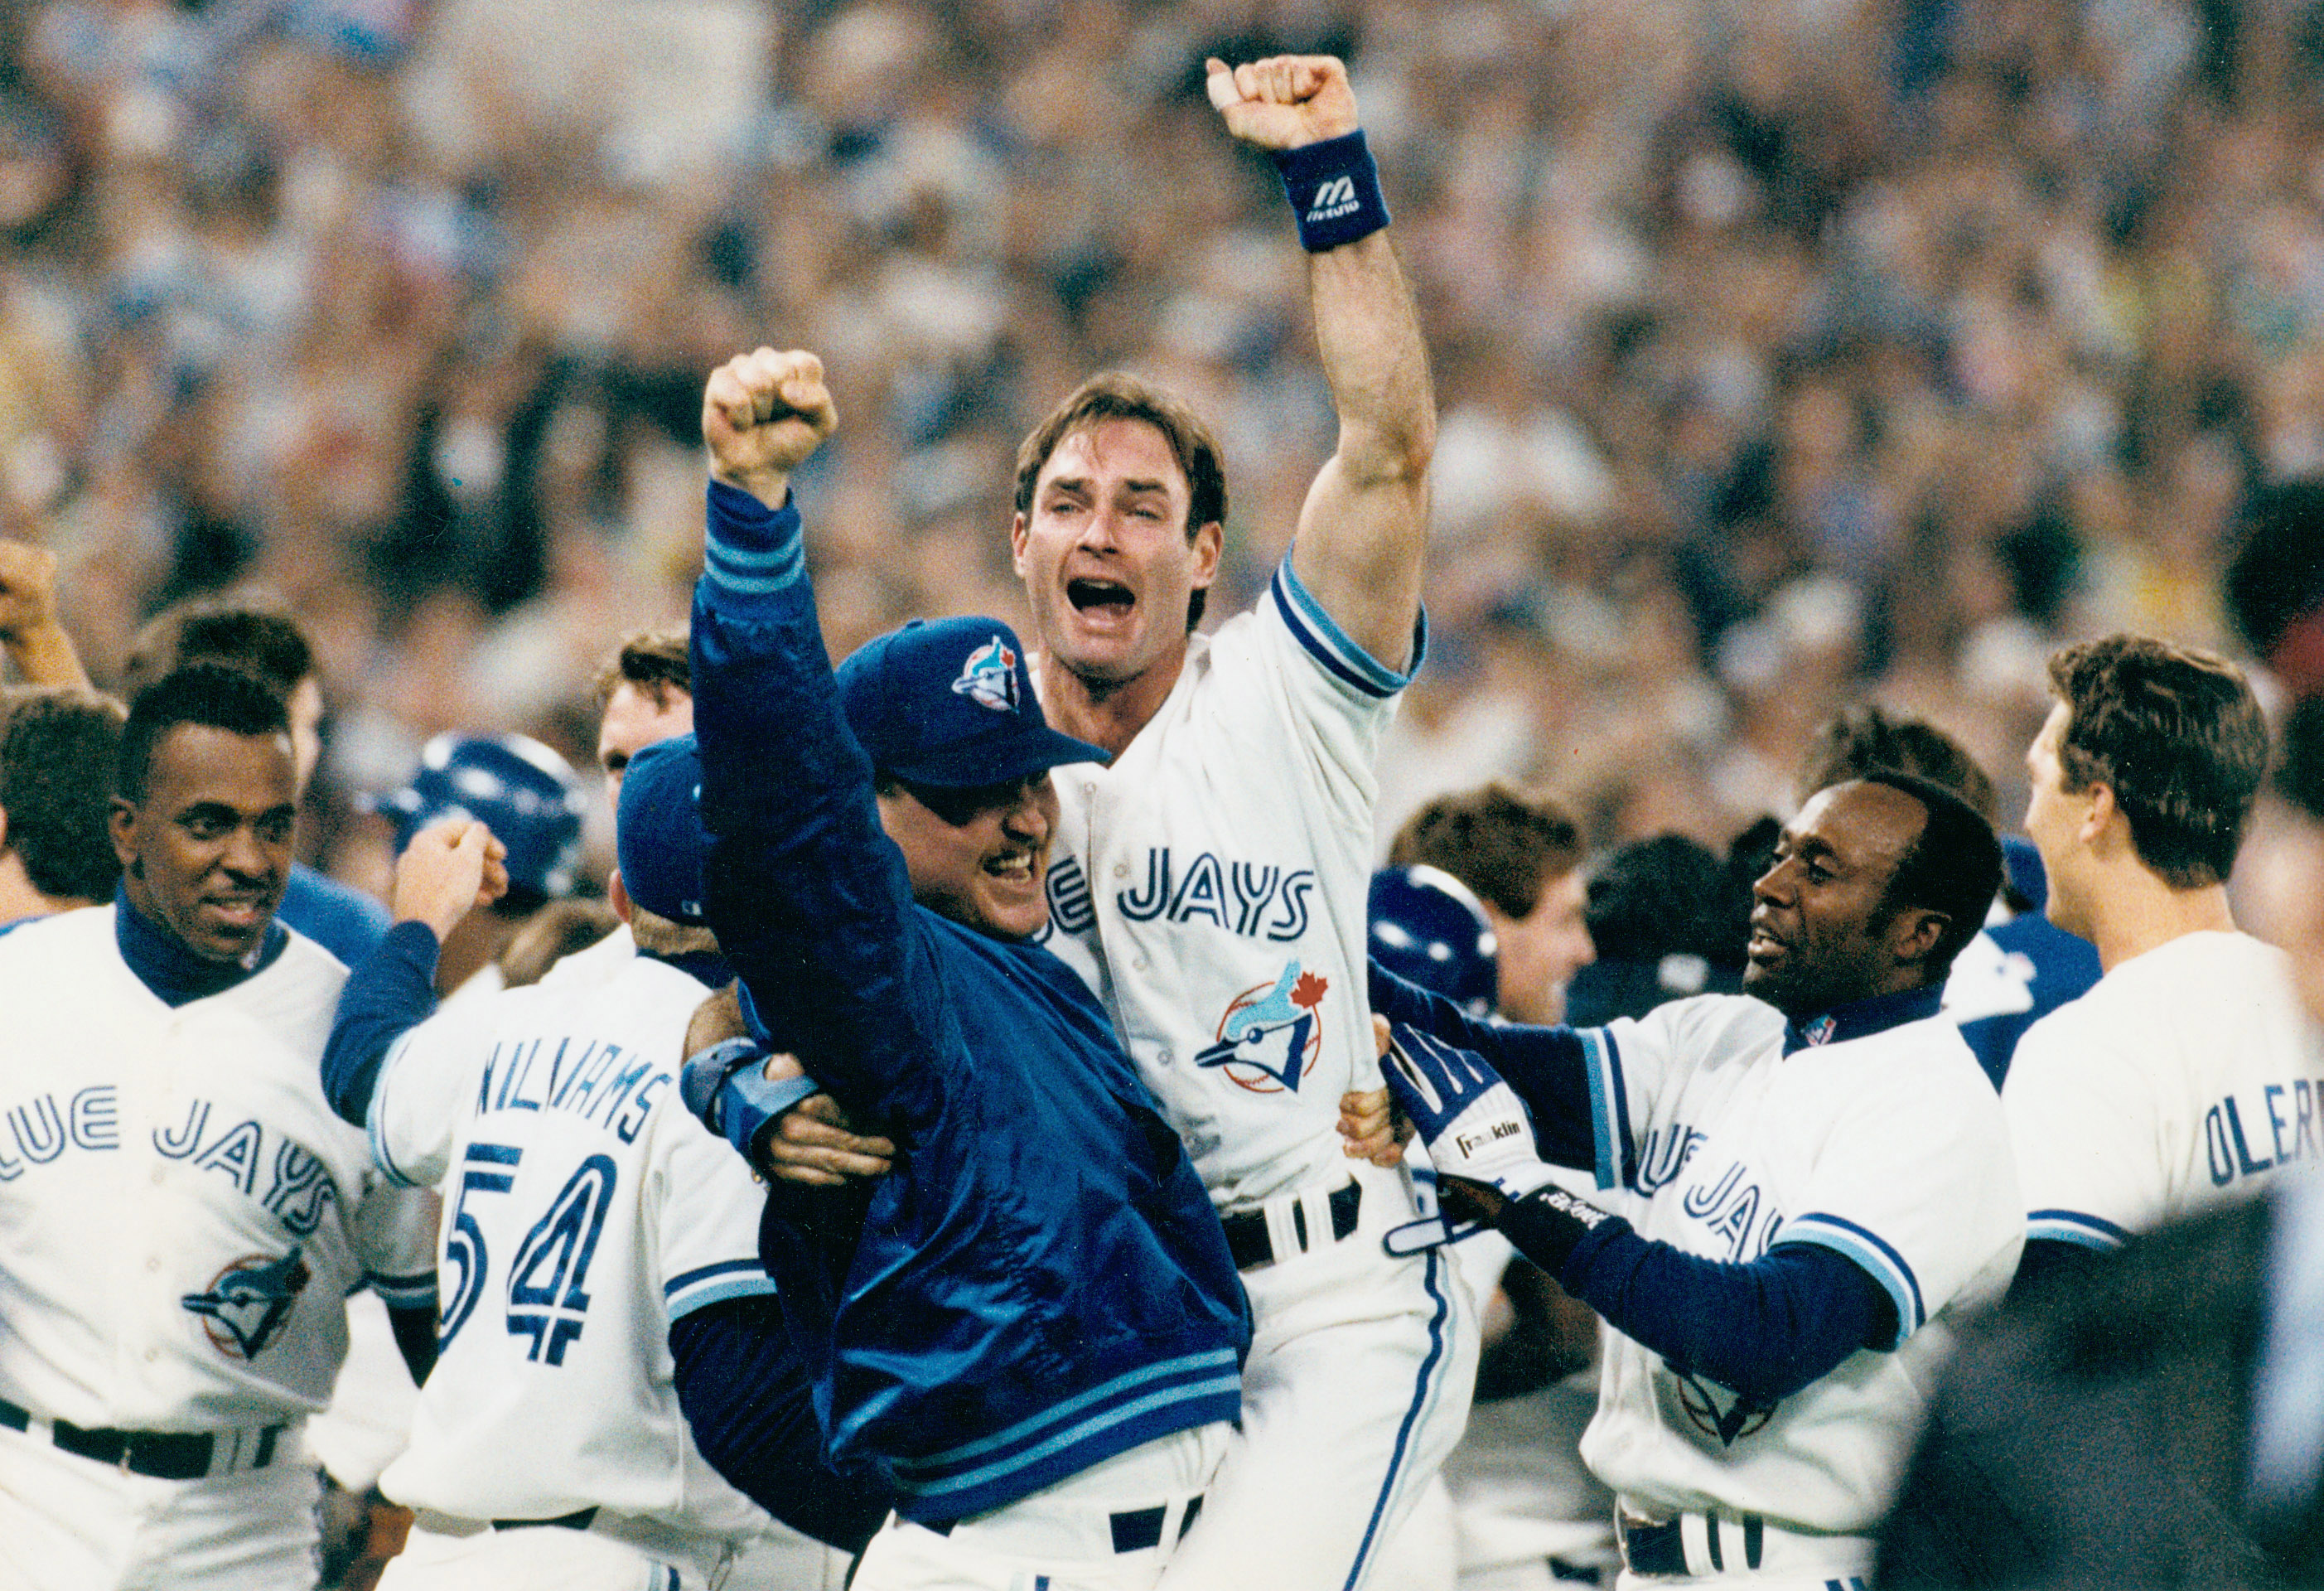 MLB: 1993 World Series